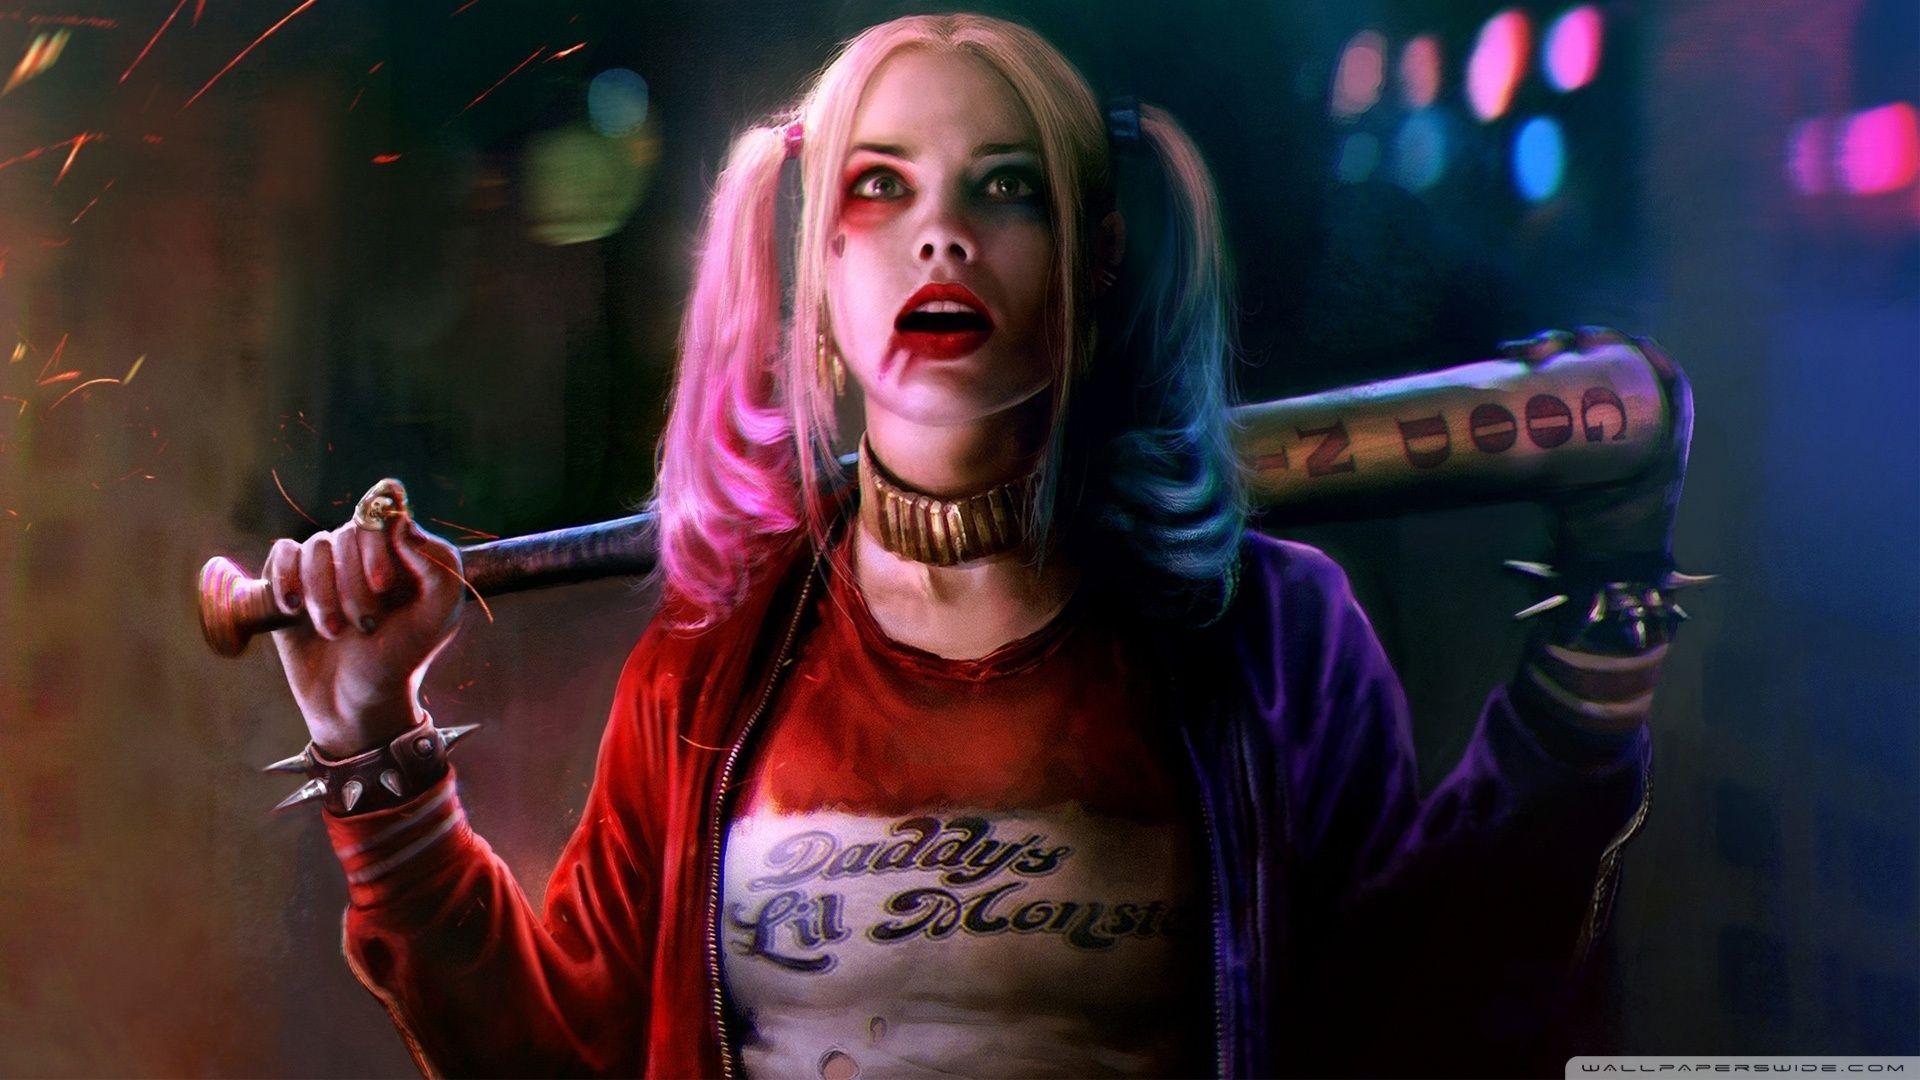 Suicide Squad Harley Quinn, Desktop Wallpaper